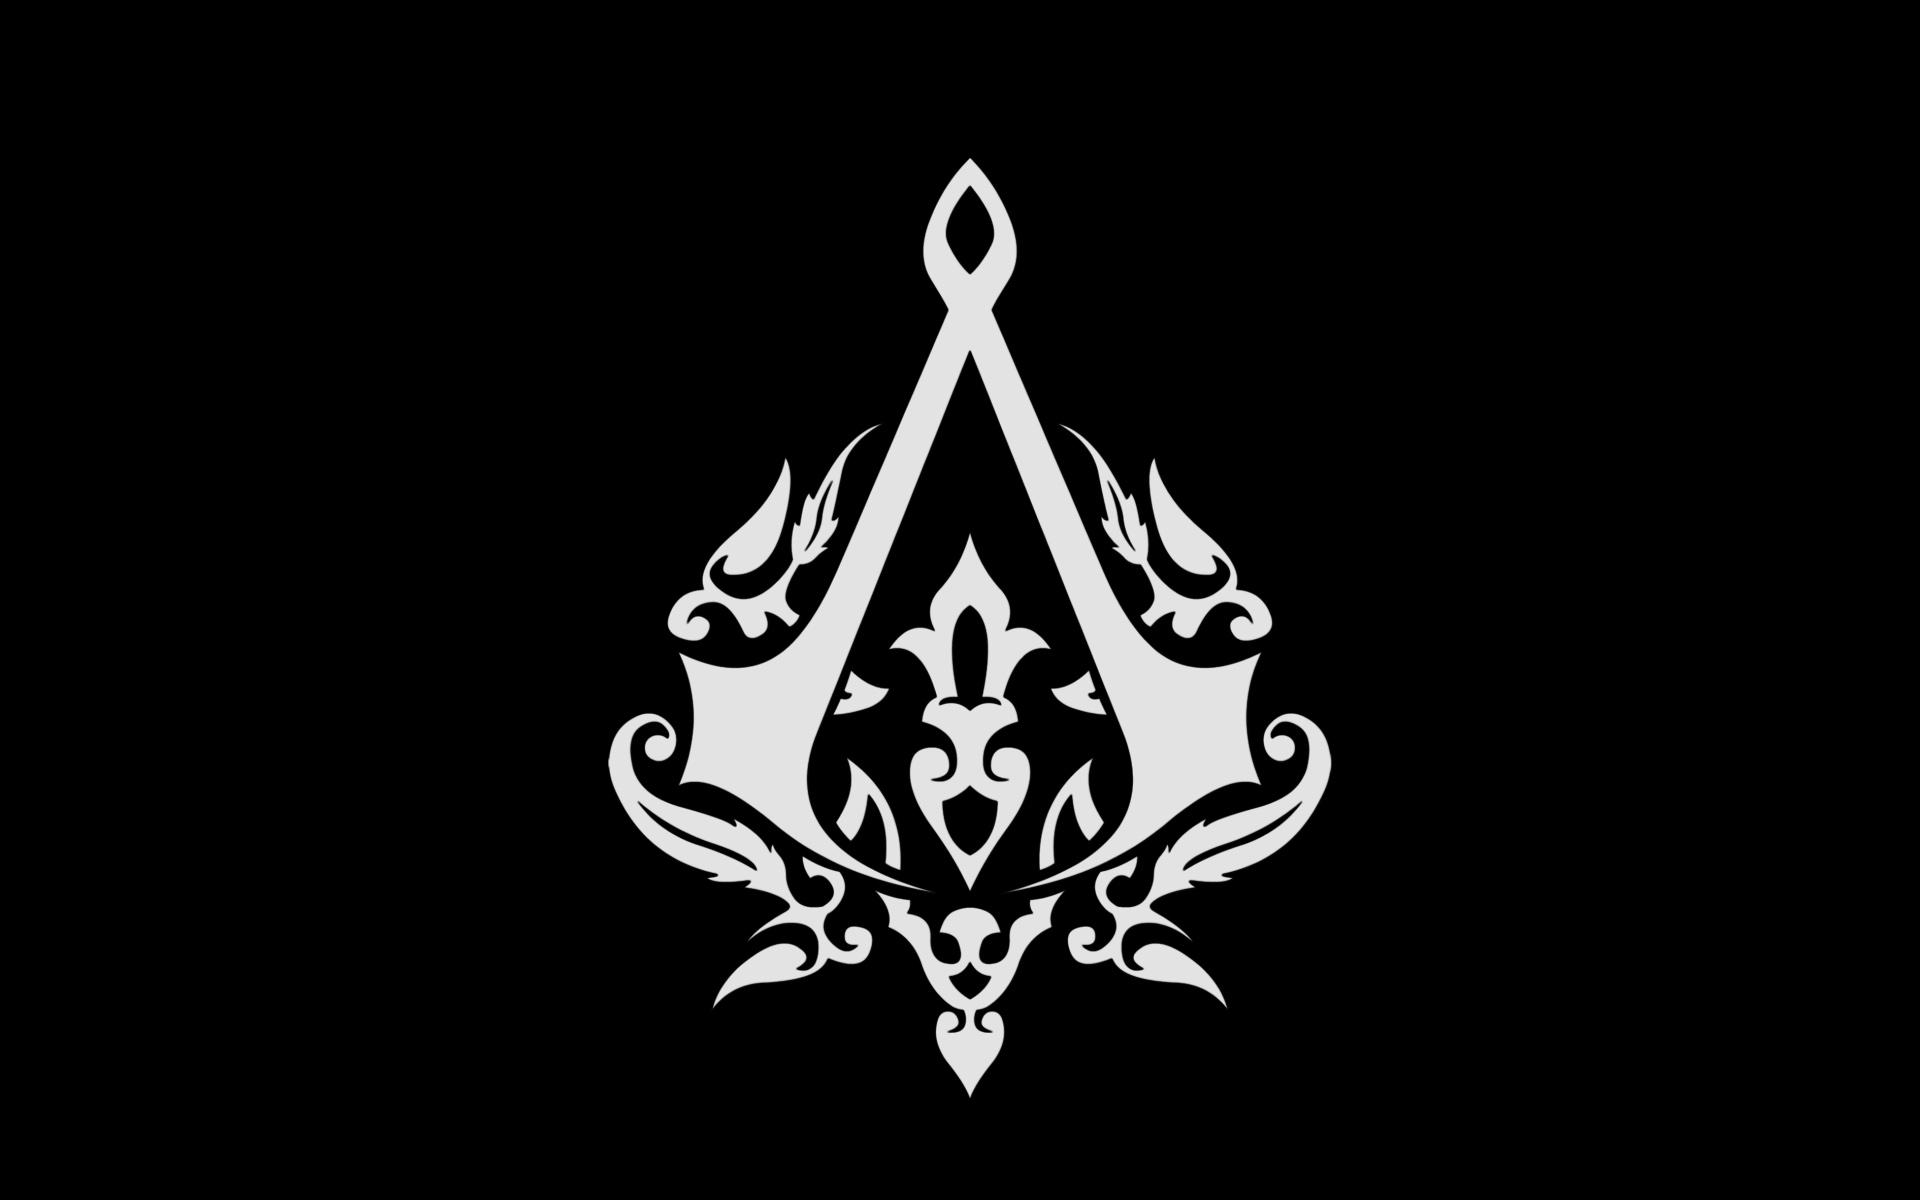 72 Assassins Creed Symbol Wallpaper On Wallpapersafari